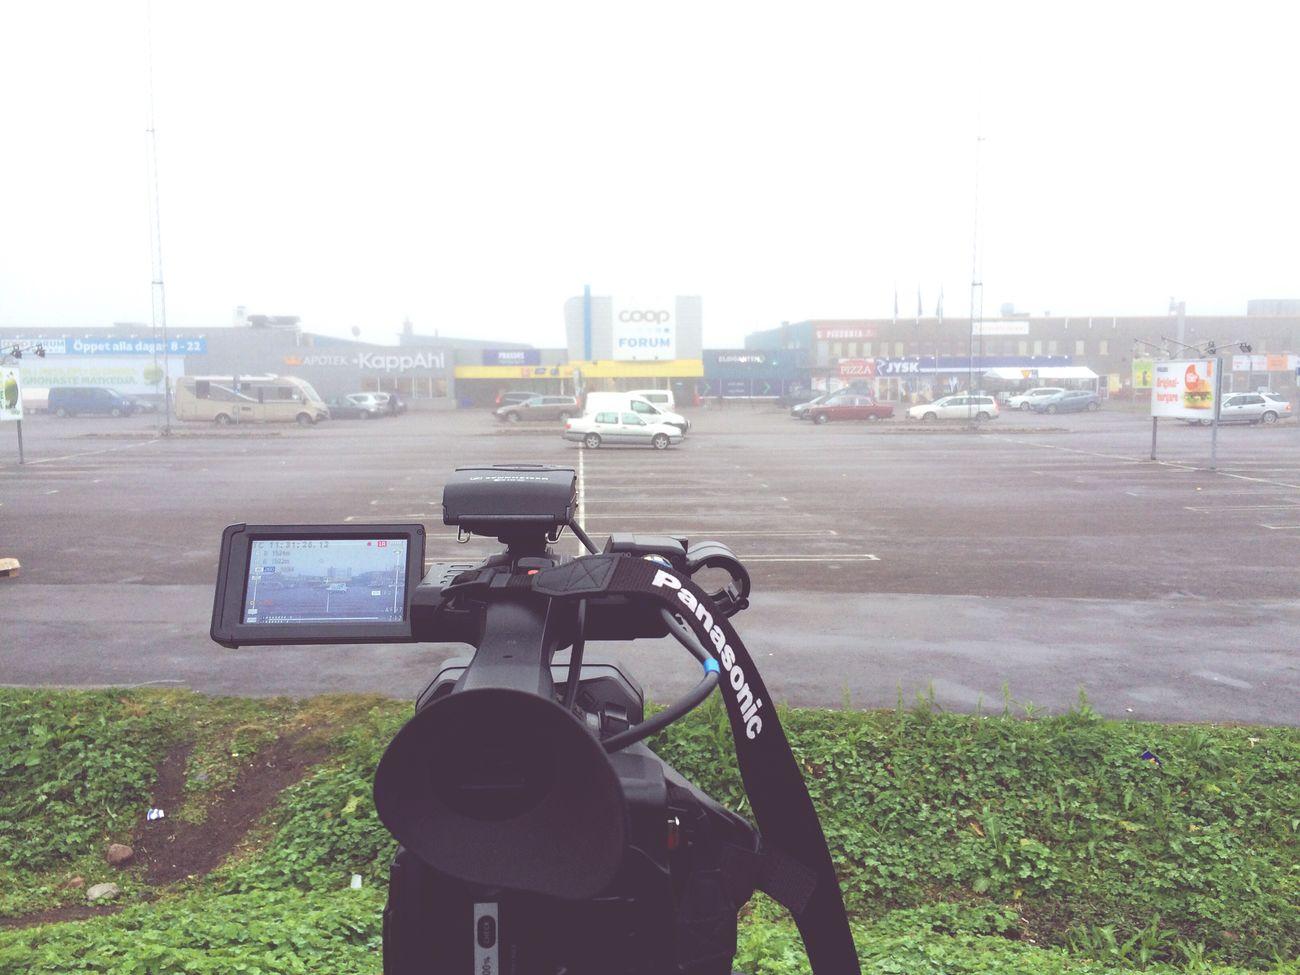 """Kiruna The Drift Block"" ""Kiruna Ortdrivaren"" Documentary film Sweden noth Scandinavia Liselottewajstedt FilmpoolNord ©Liselottewajstedt Coop"